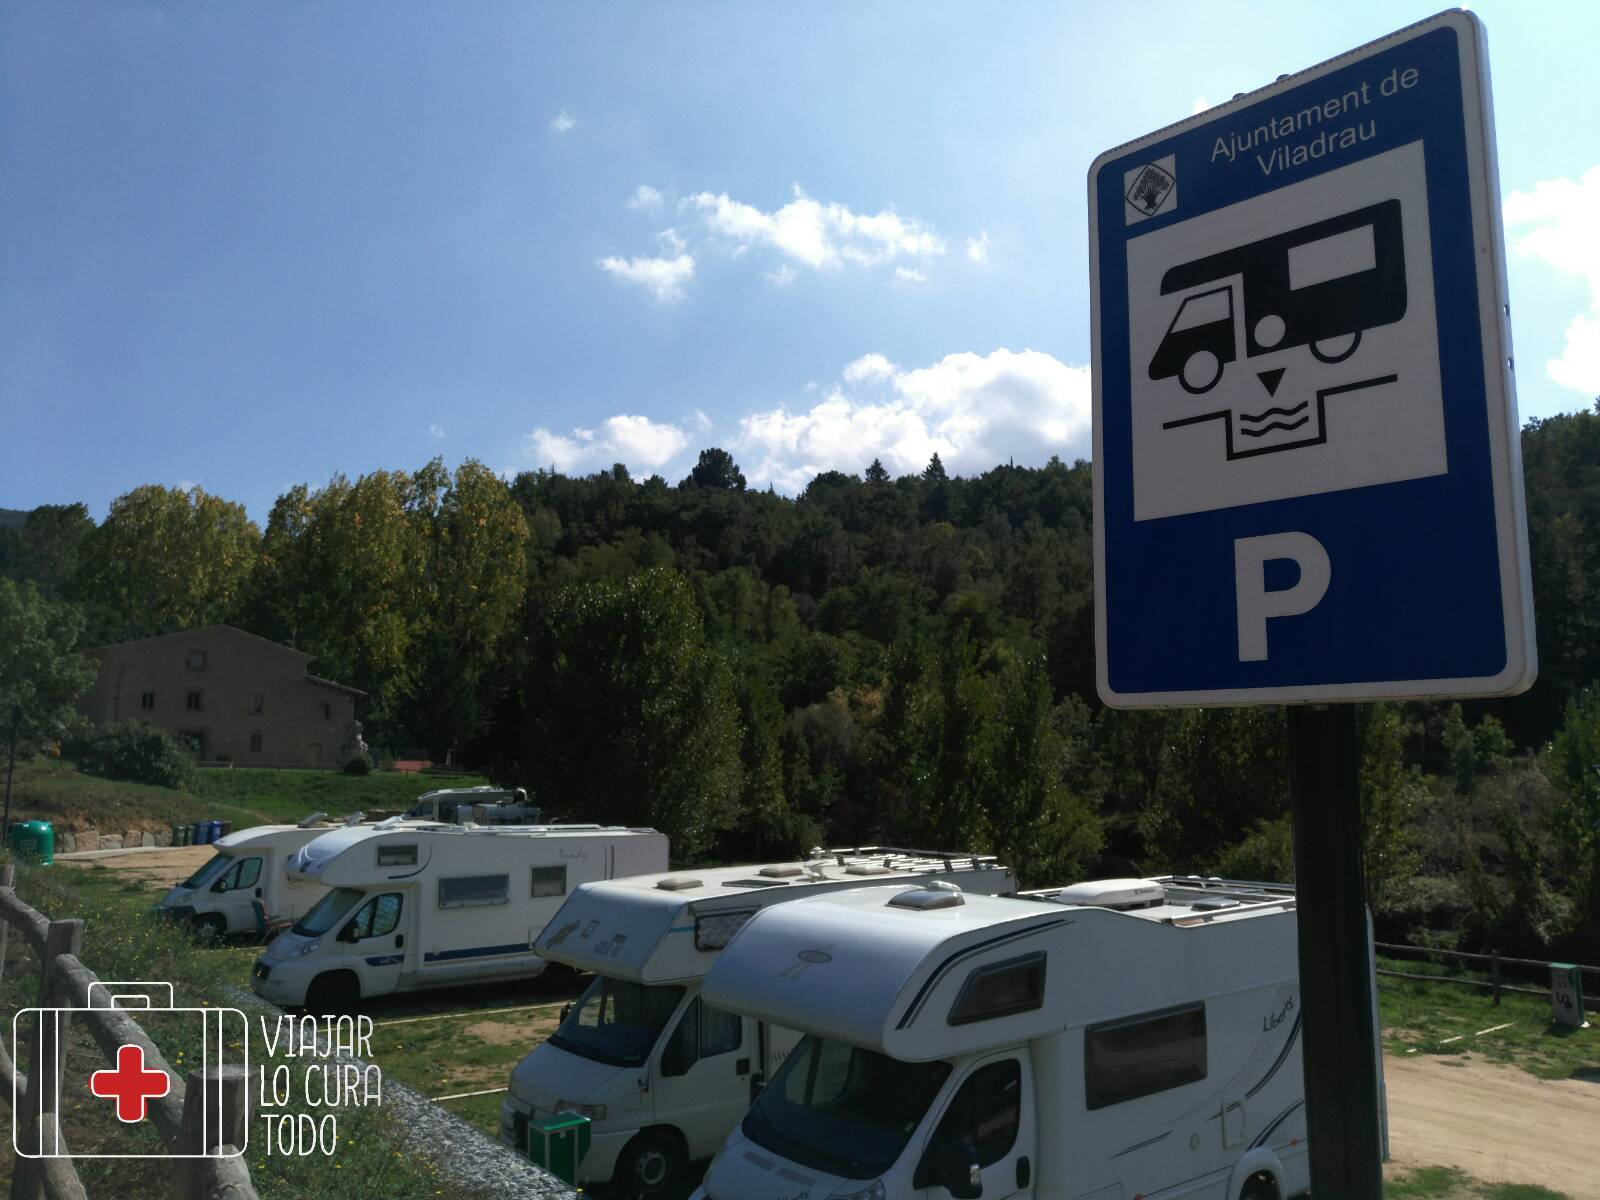 Área de autocaravanas en Viladrau. ¡Así sí!